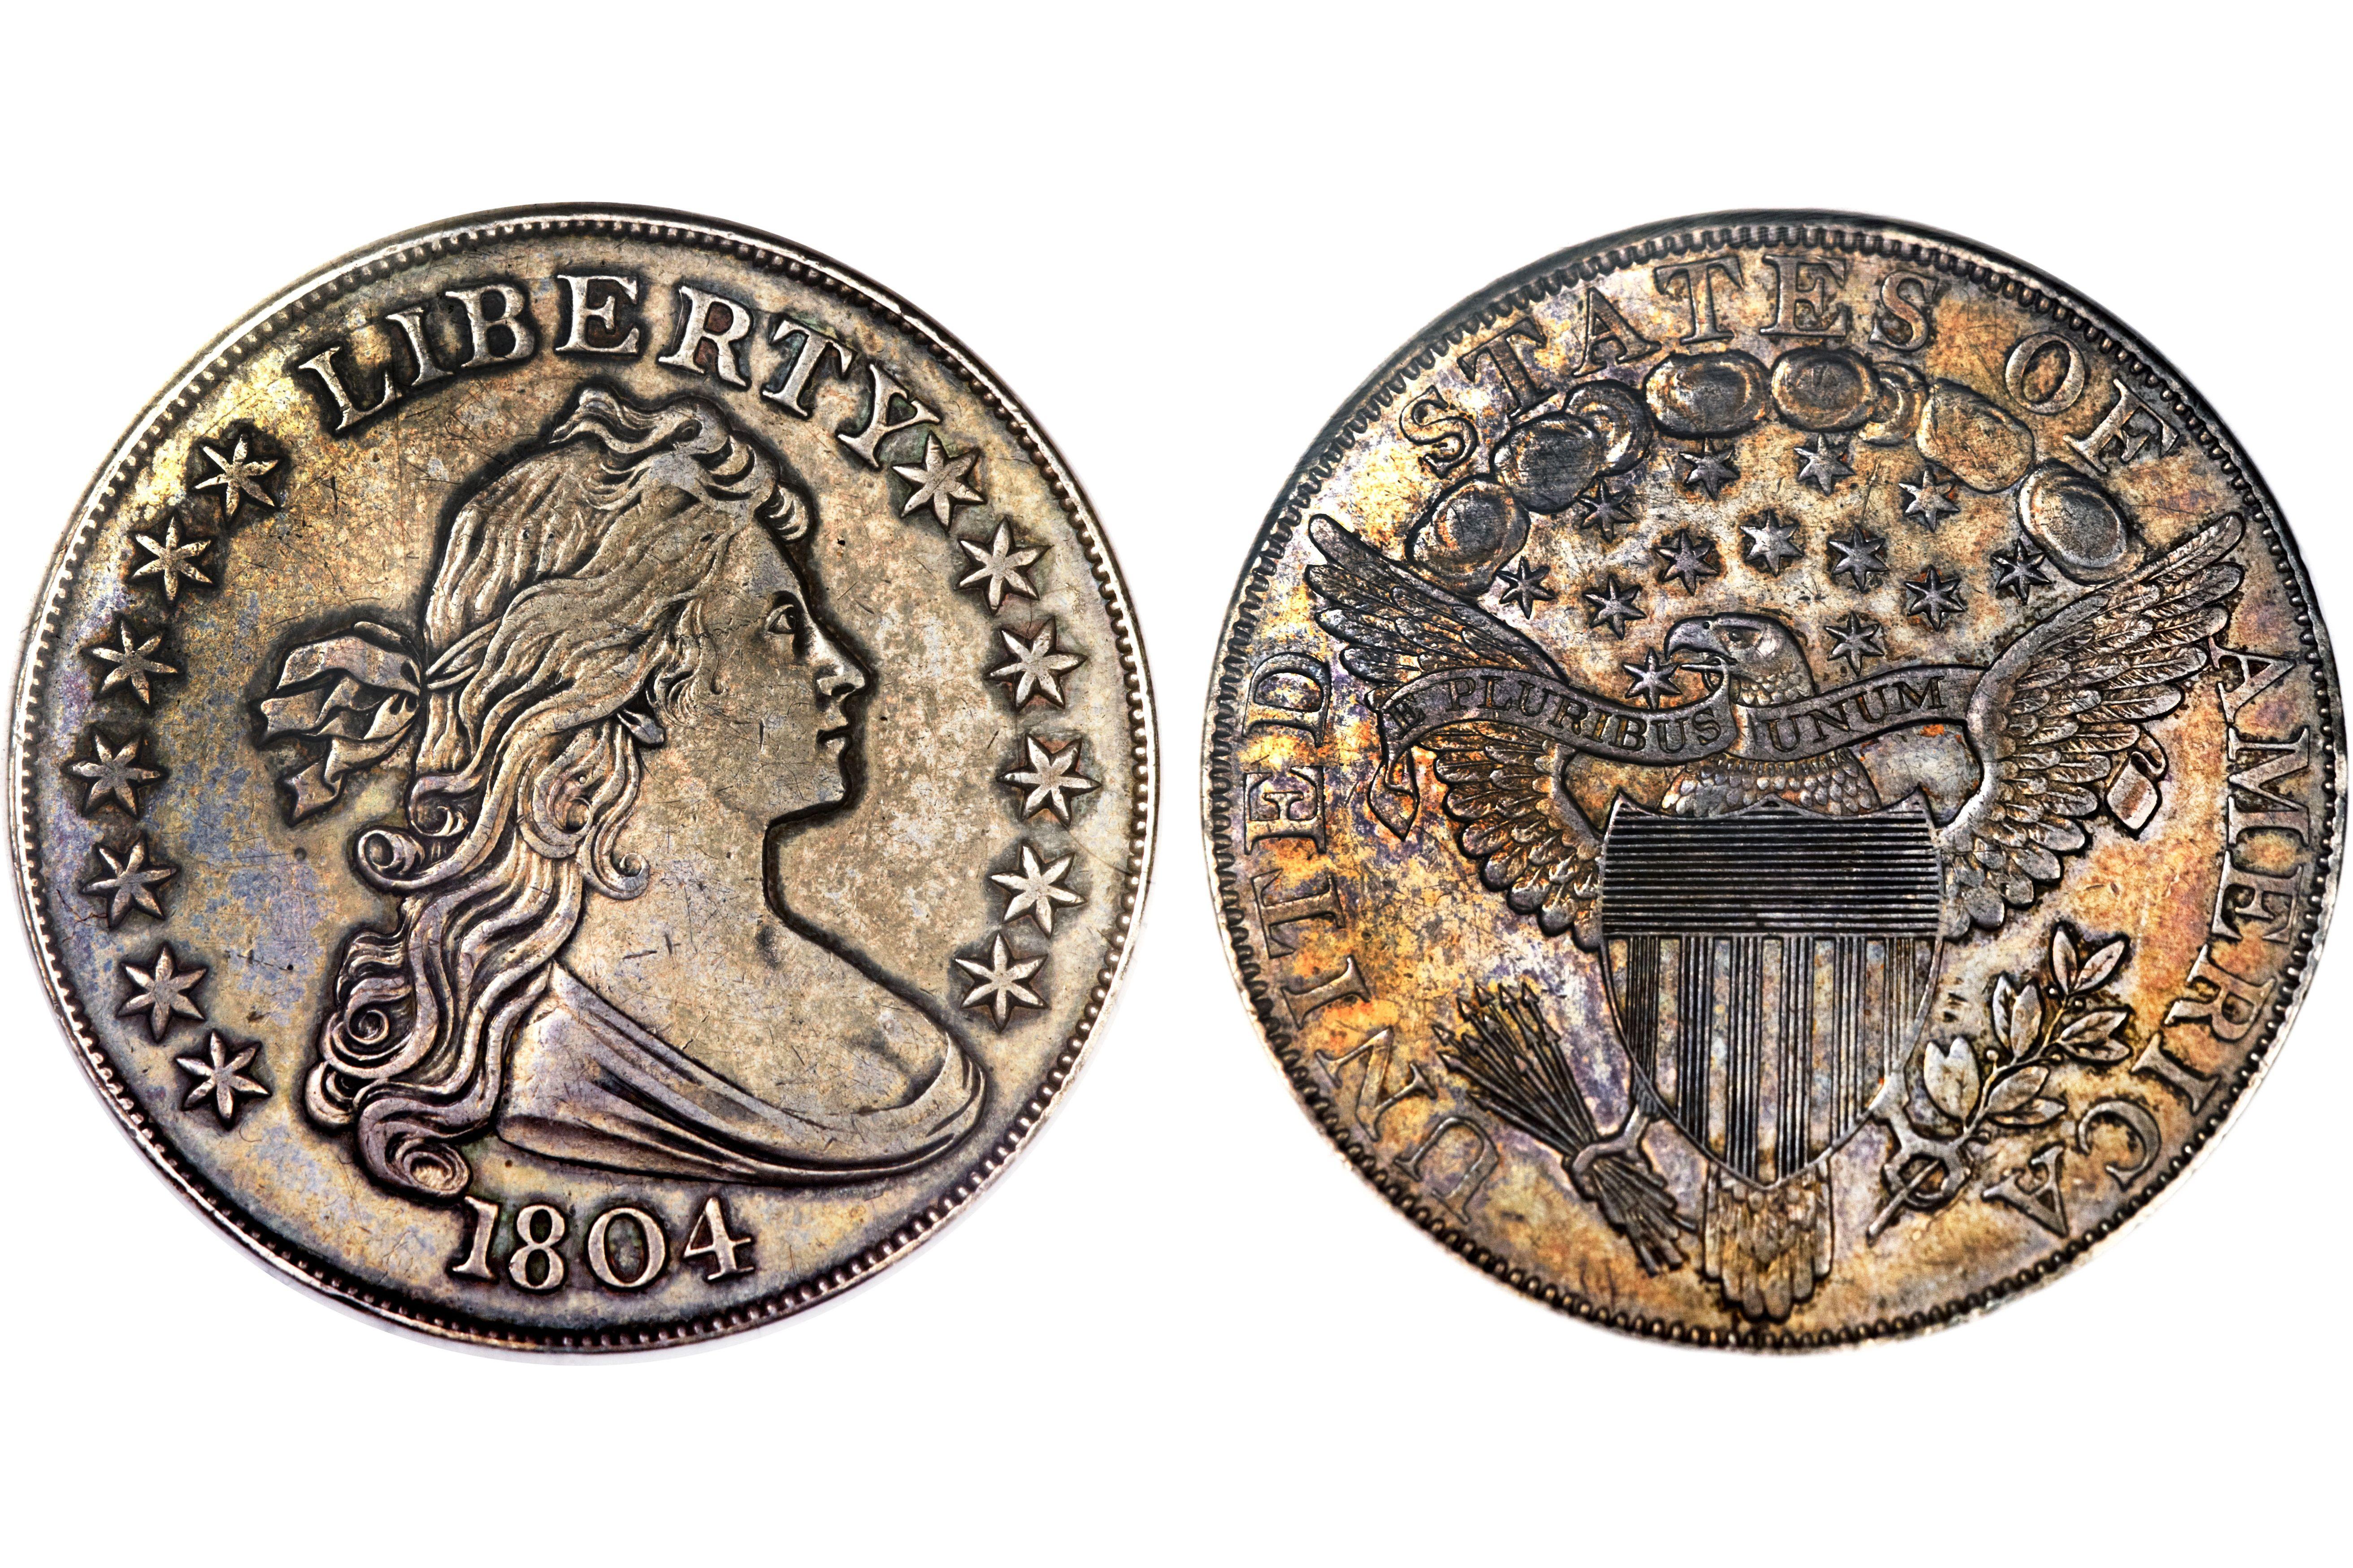 The Mickley-Hawn-Queller 1804 Silver Dollar